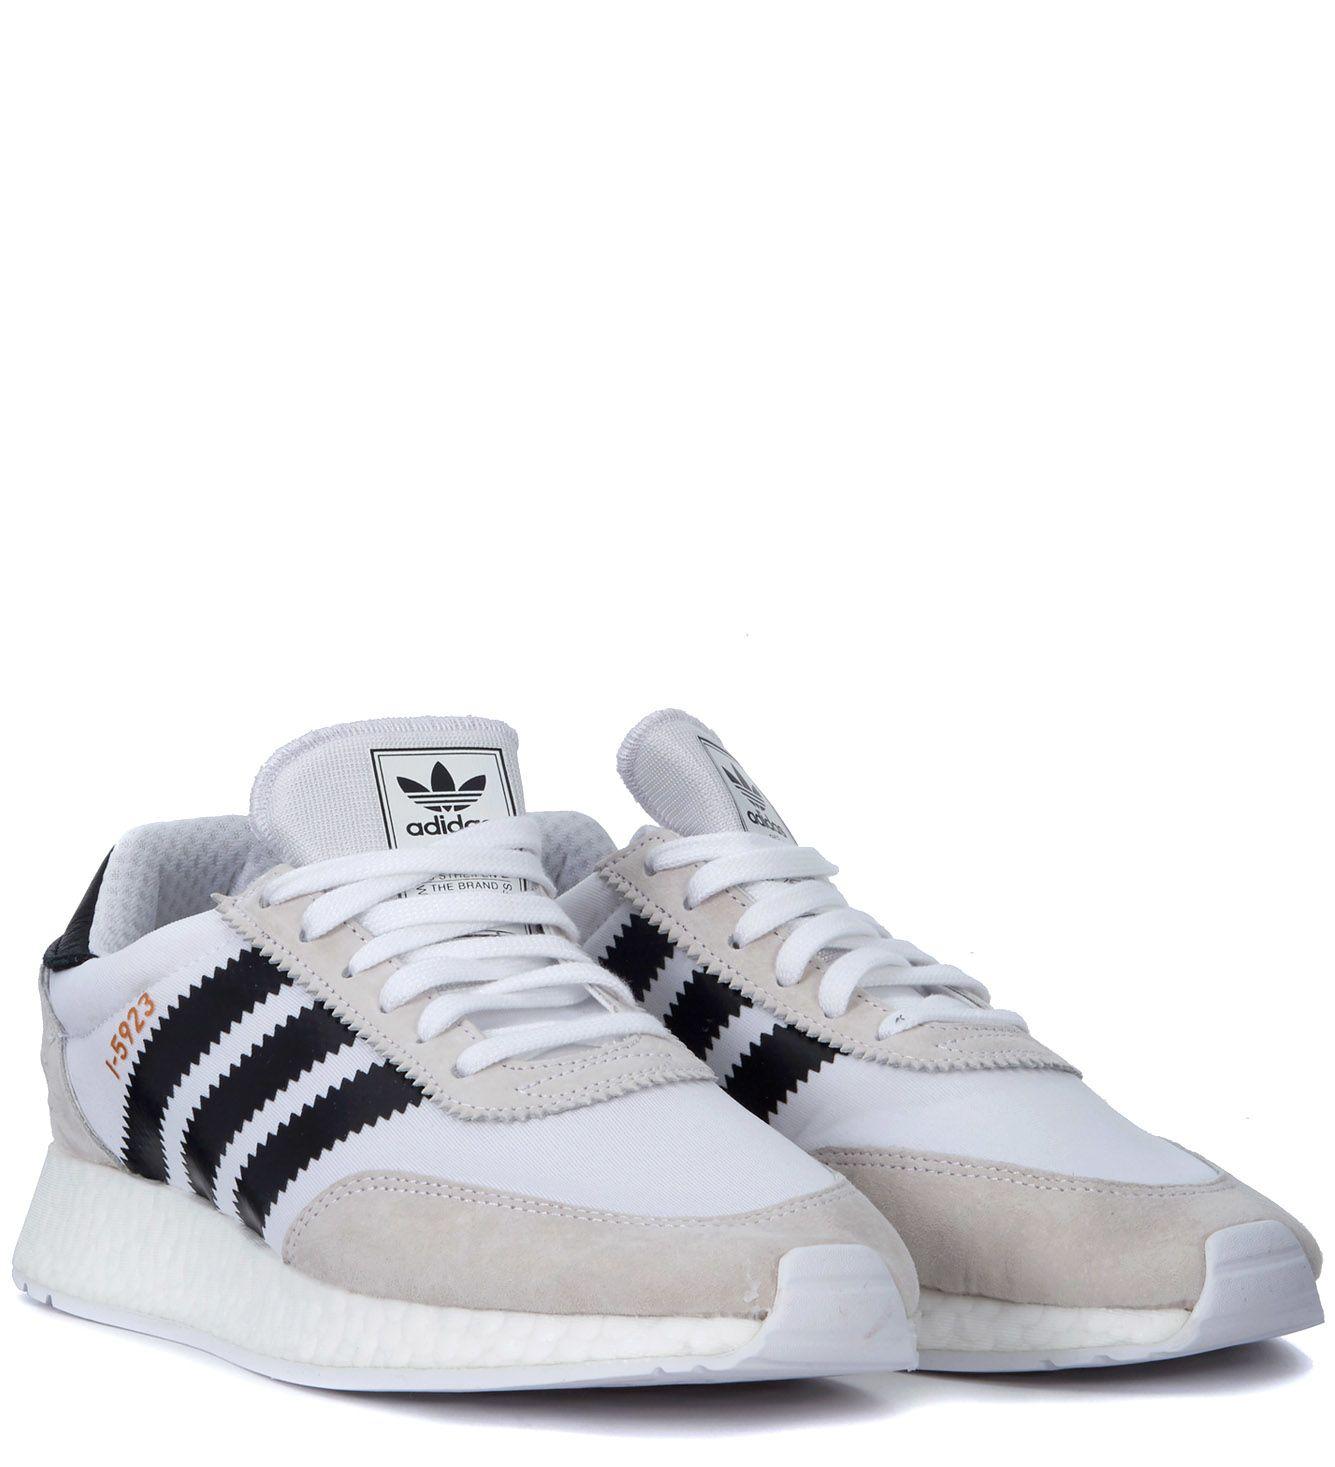 adidas I-5923 MESH & NUBUCK SNEAKERS IHT2fYdyUH